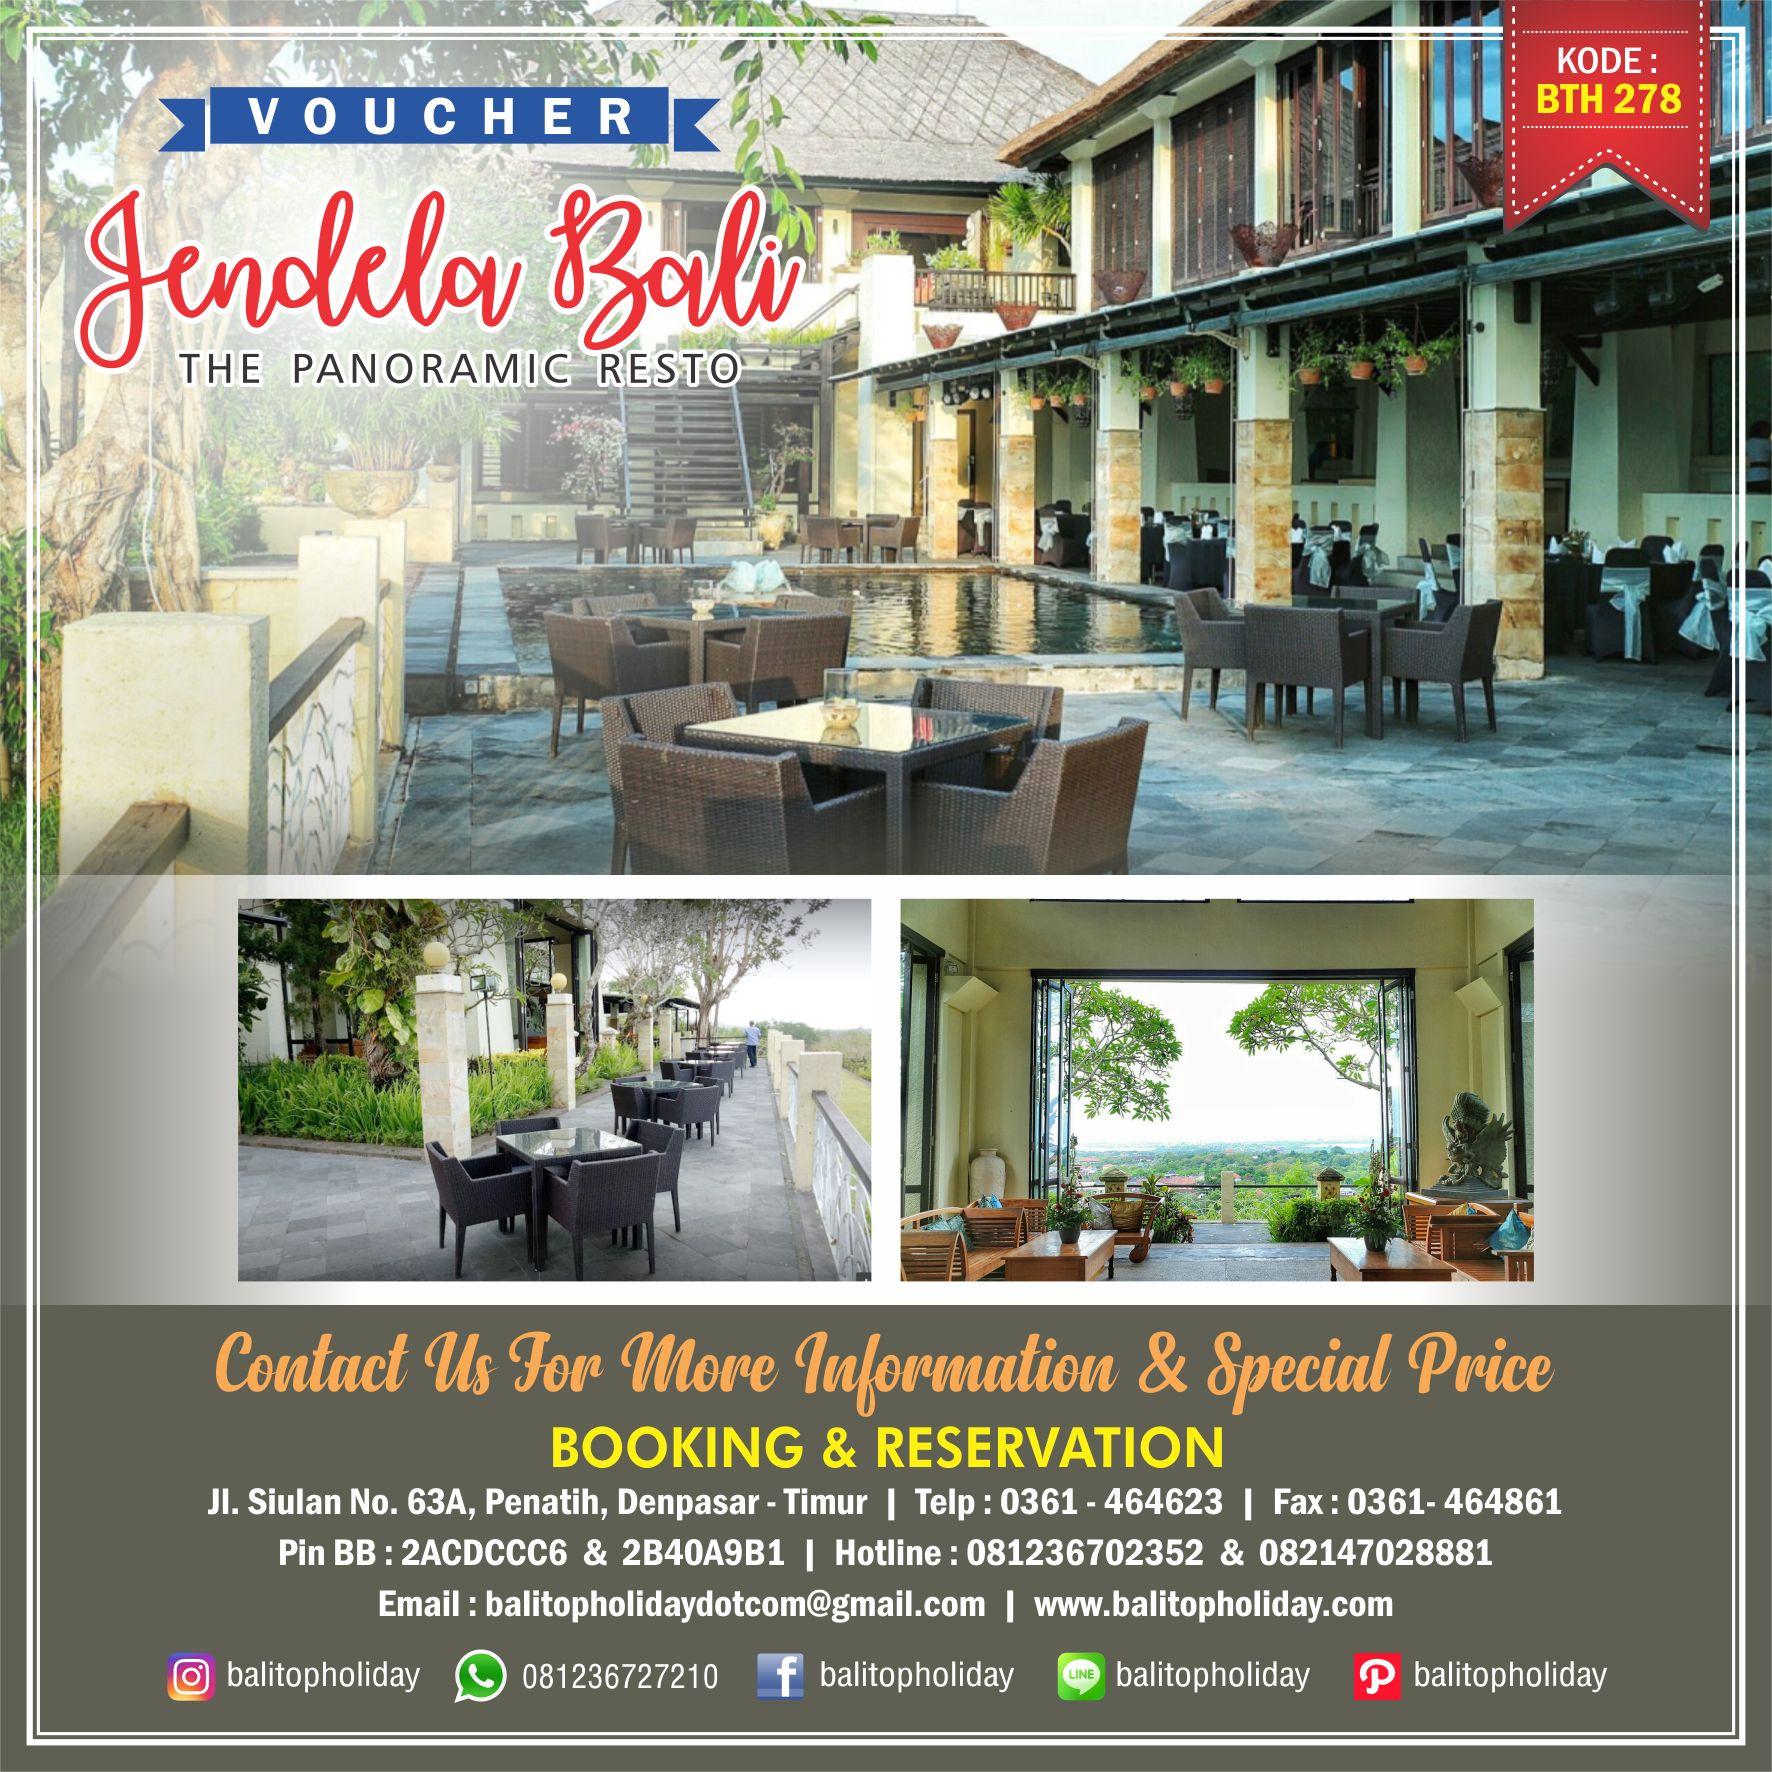 Voucher Jendela Bali